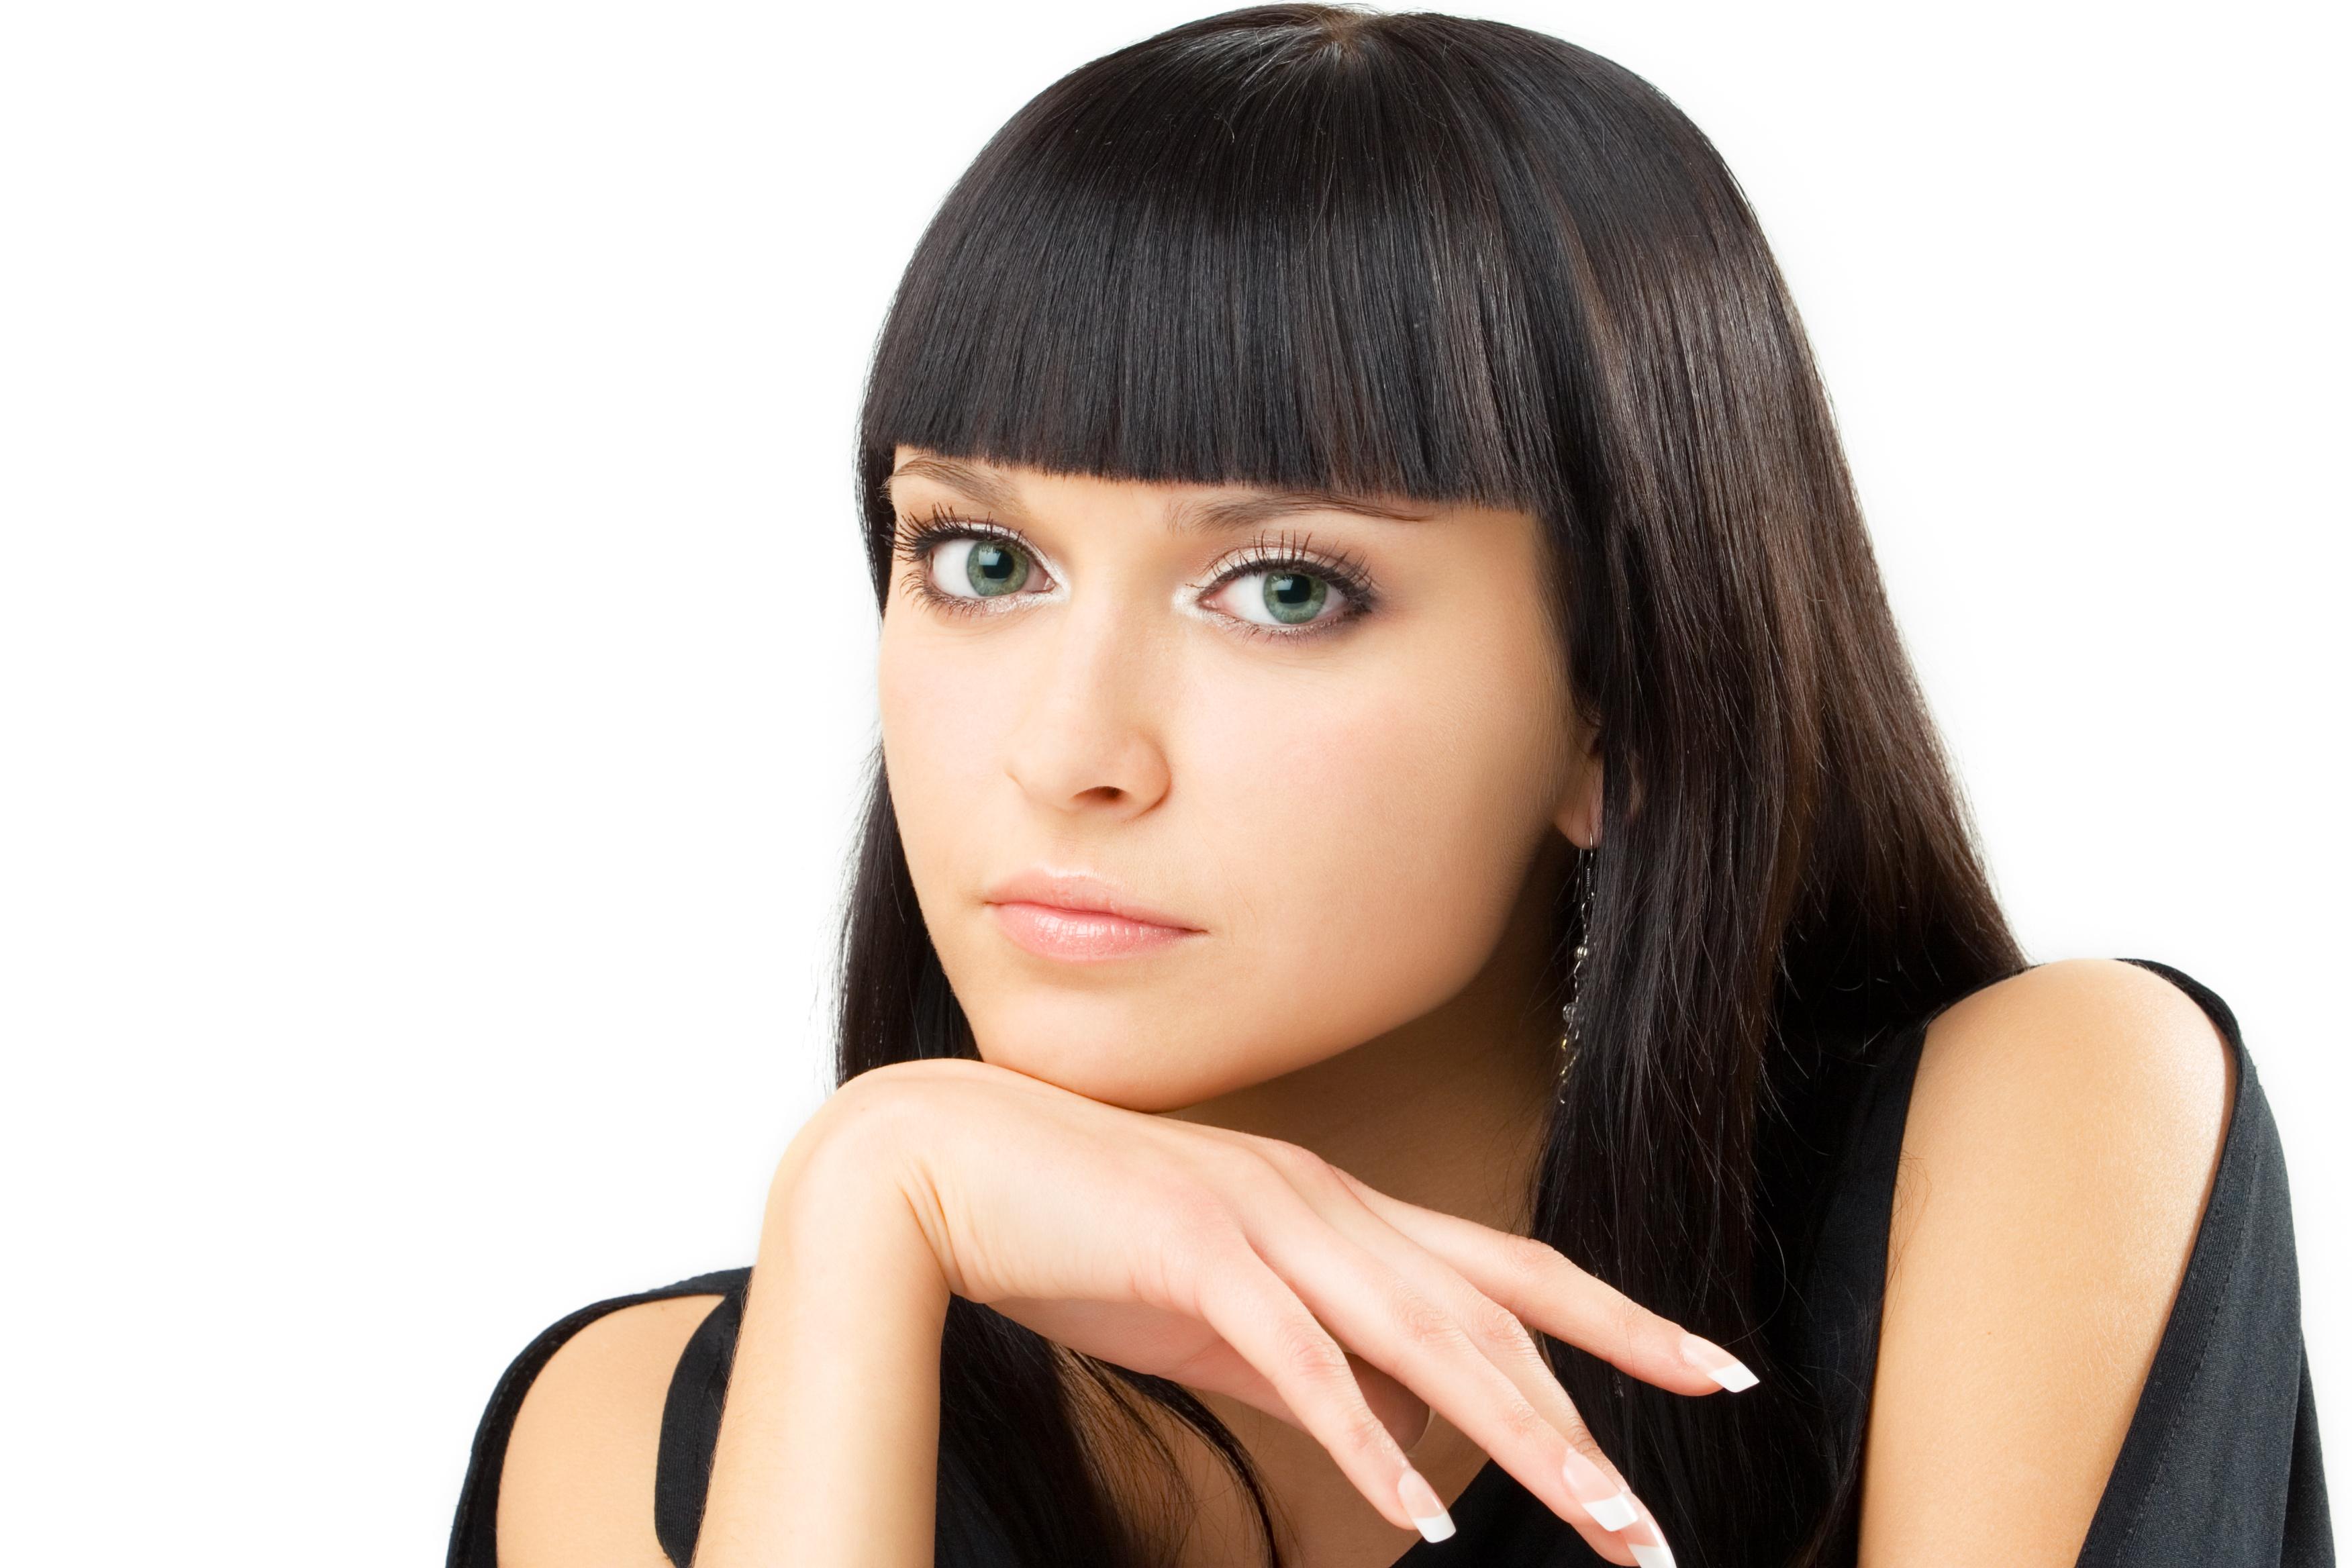 Стрижки девушек брюнеток лицо 4 фотография